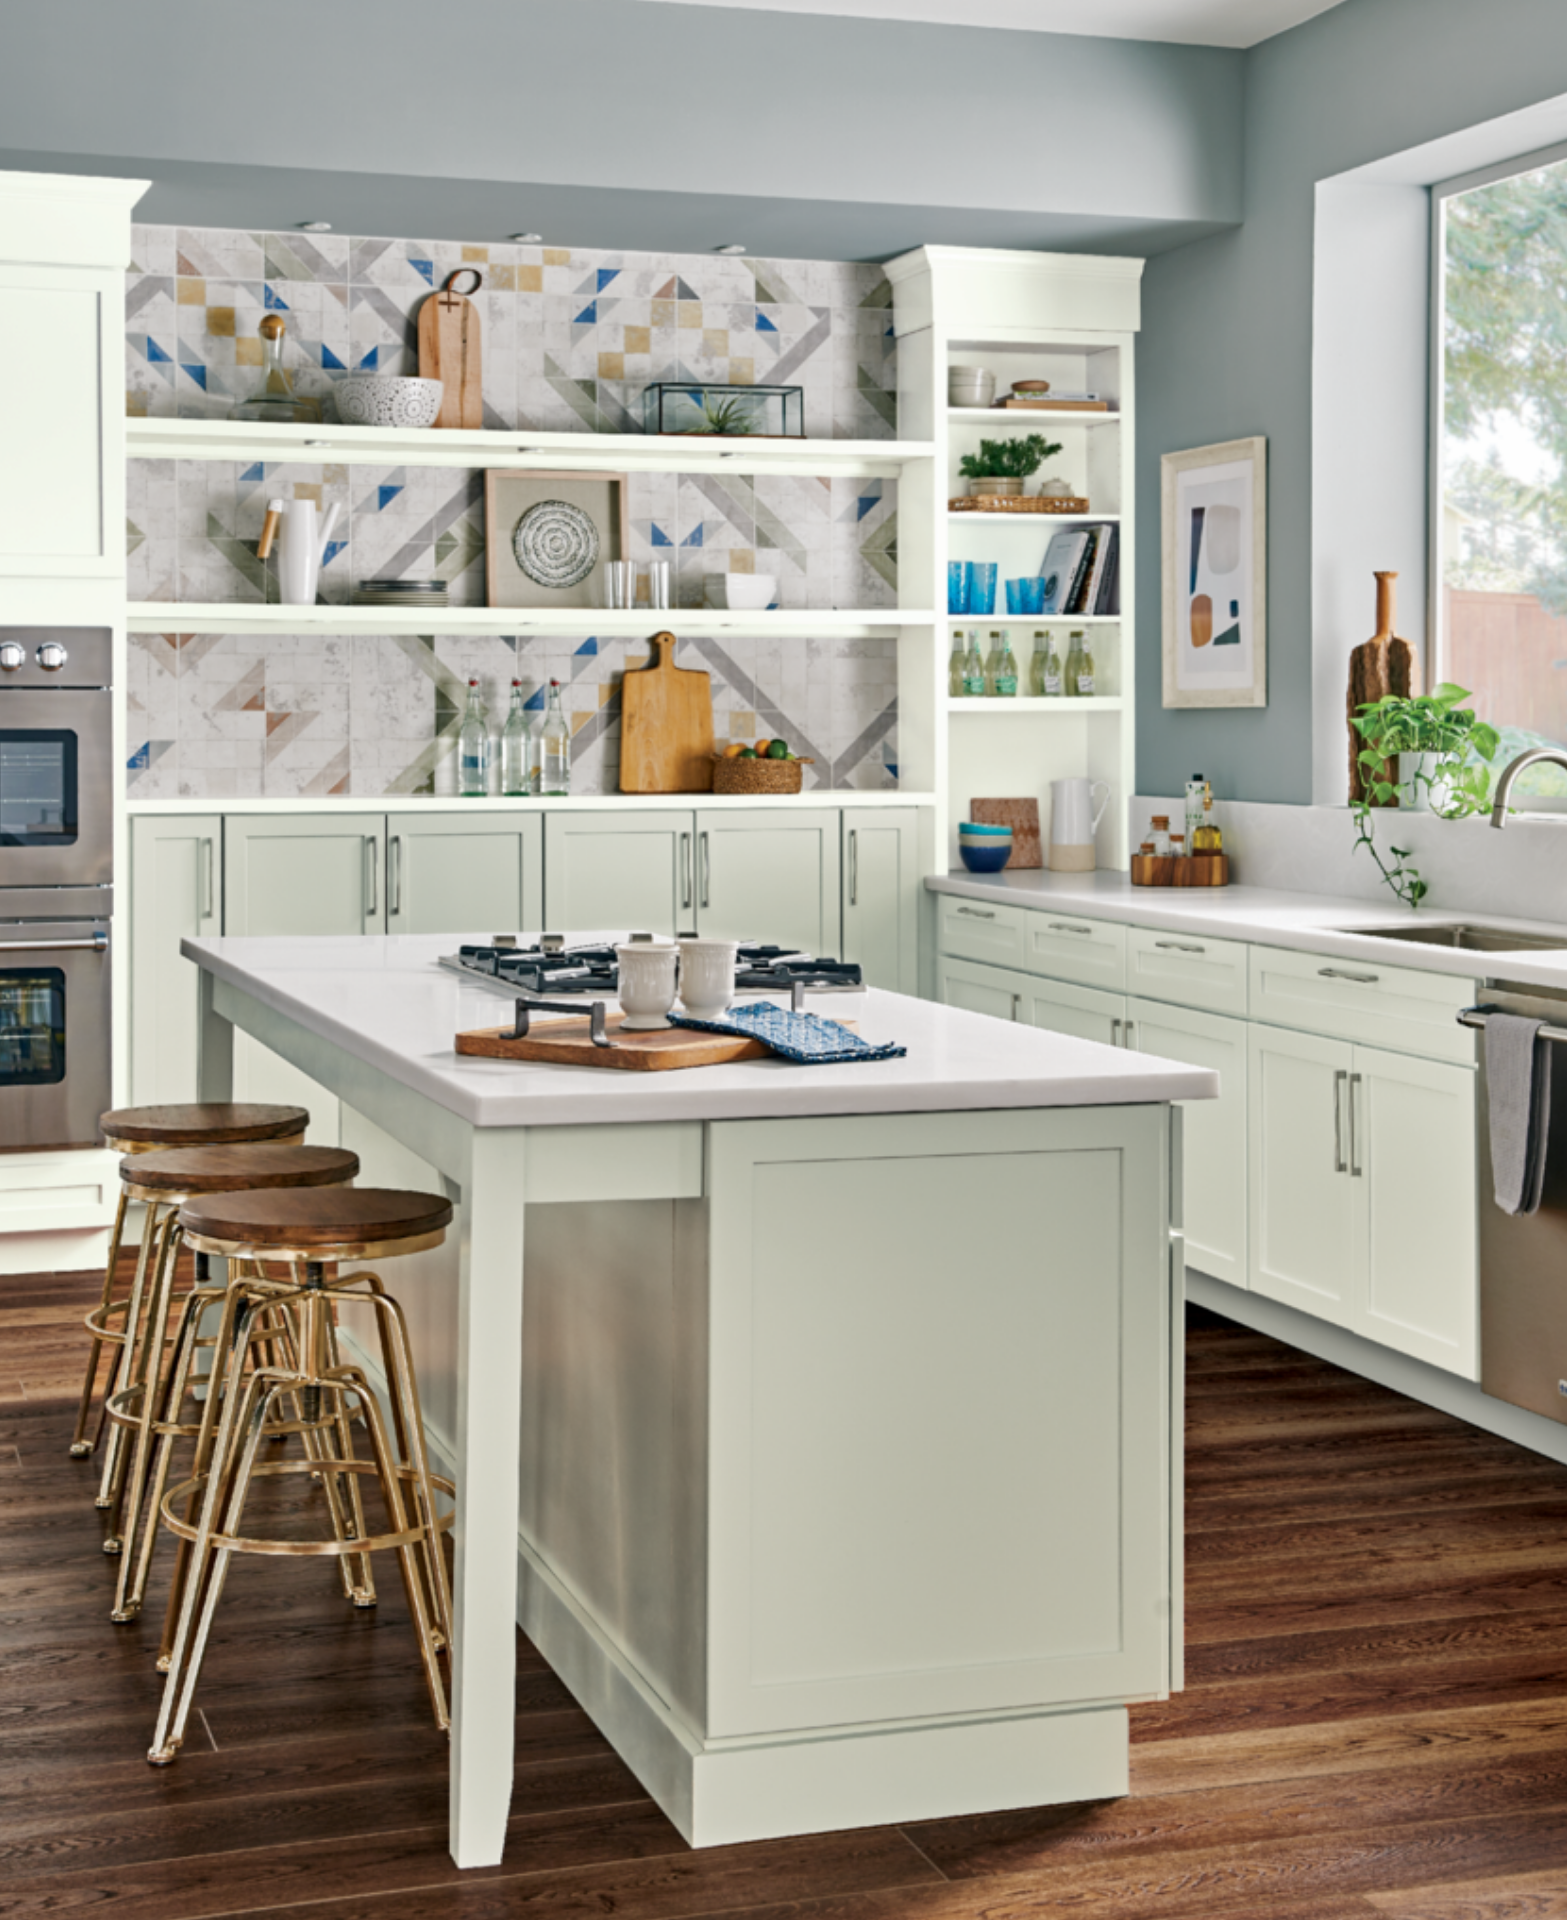 Merillat Classic Mist In 2020 Kitchen Design Buy Cabinets Cabinetry